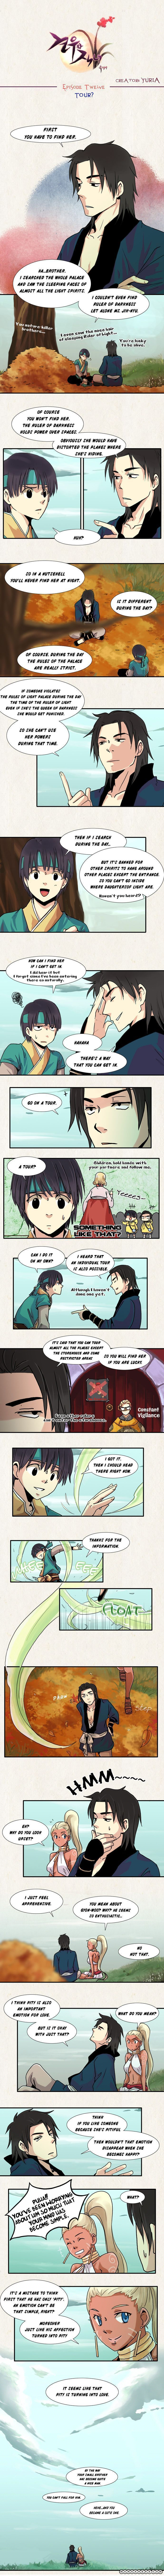 Gyon Woo Jik Nyu 12 Page 2